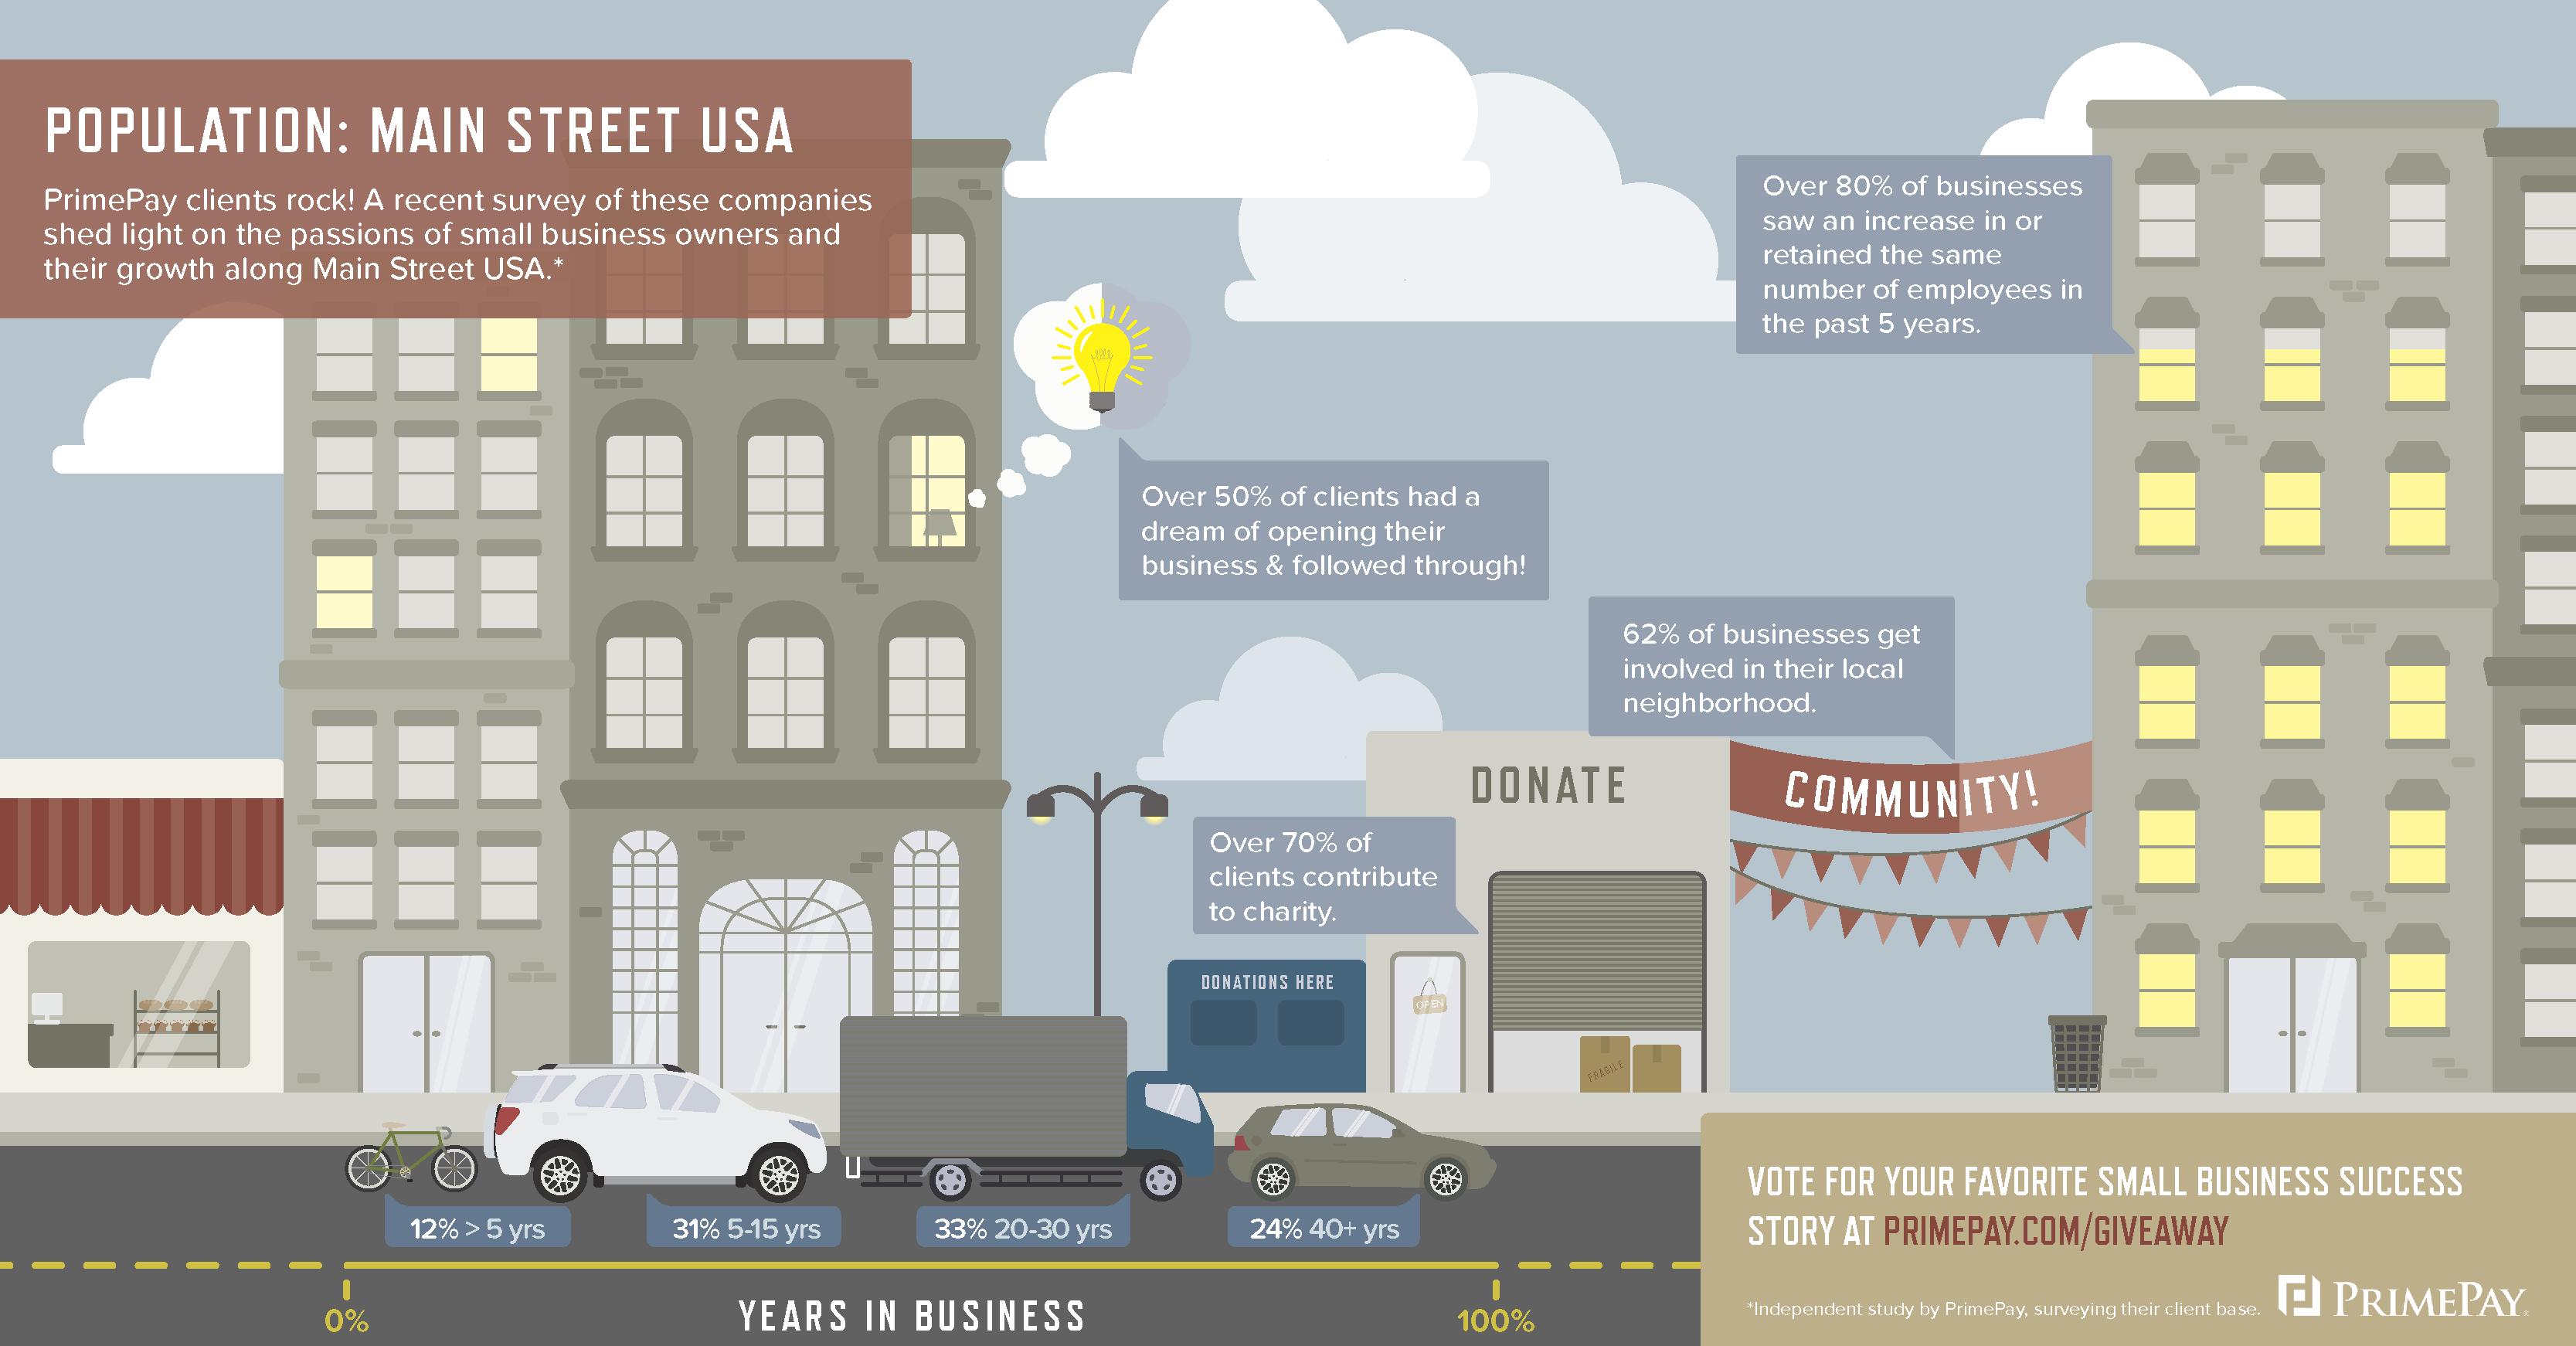 Population - Main Street USA Infographic